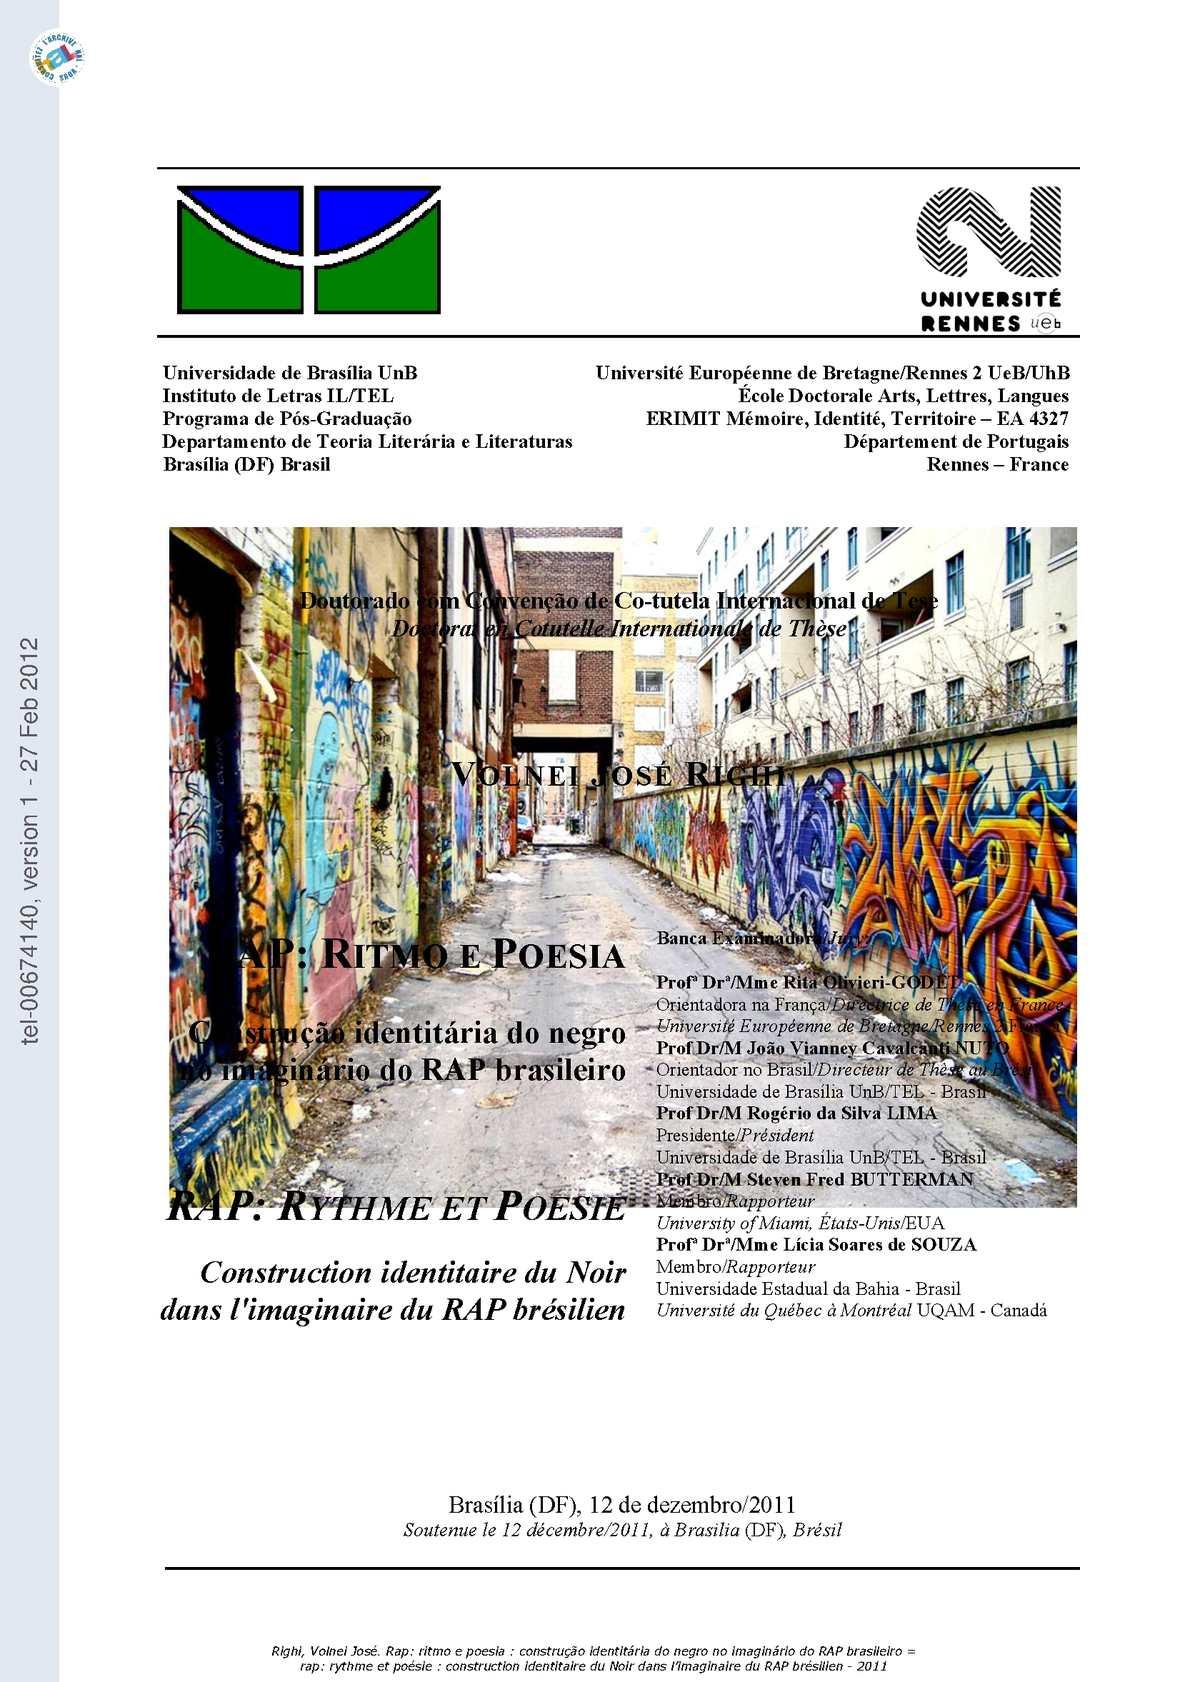 acaa65461 Calaméo - RAP: RITMO E POESIA # VOLNEI JOSÉ RIGHI - Universidade de  Brasília-UnB 2012